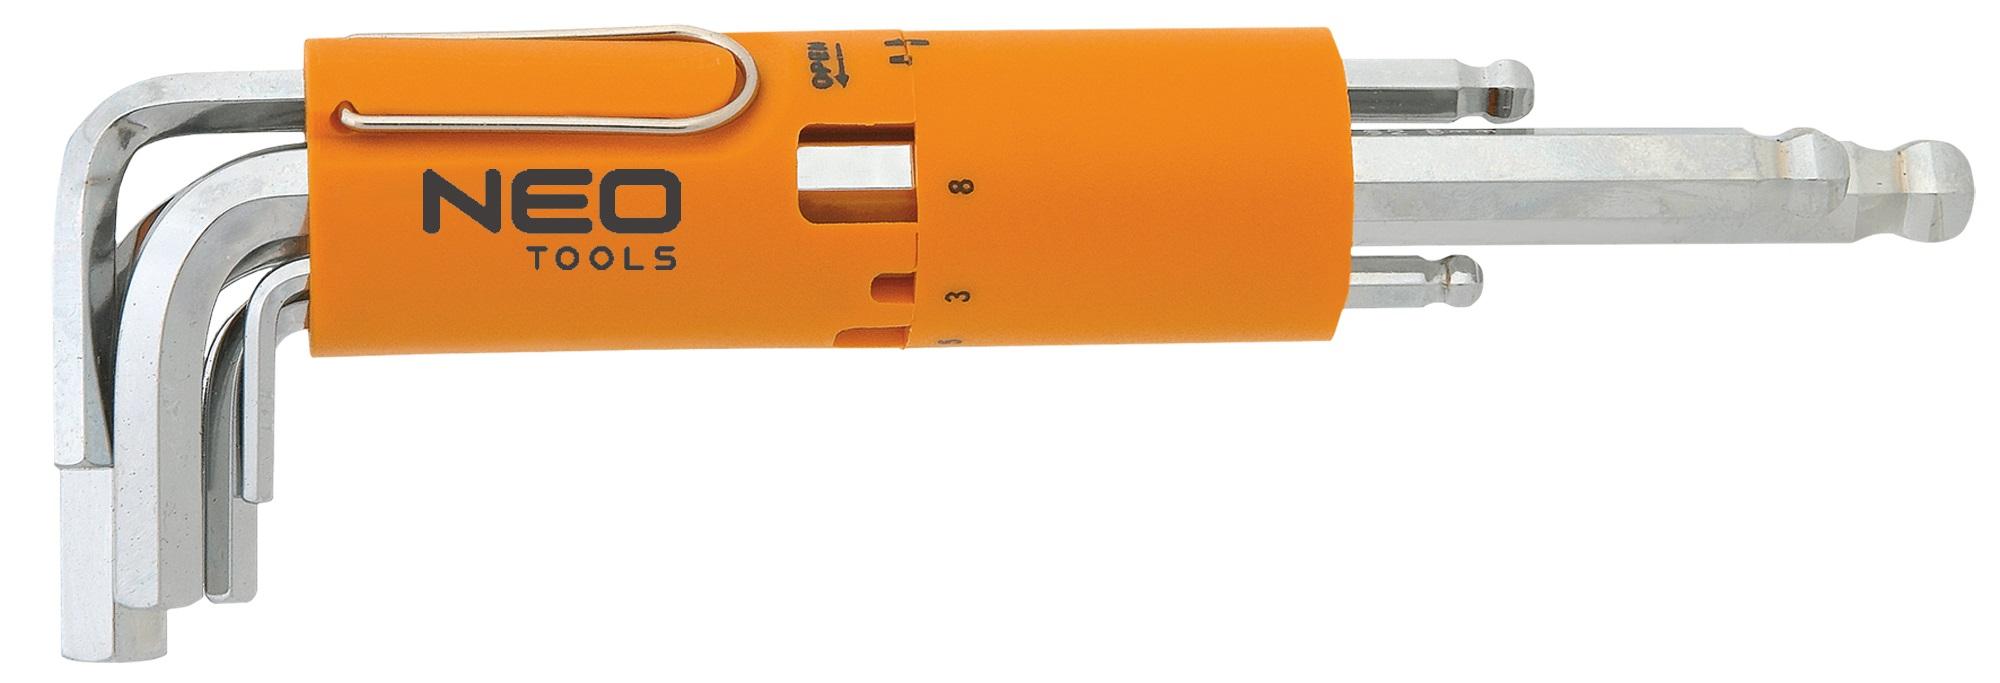 Neo Tools 09-523 Ключi шестиграннi,  2.5-10 мм, набiр 8 шт.*1 уп.